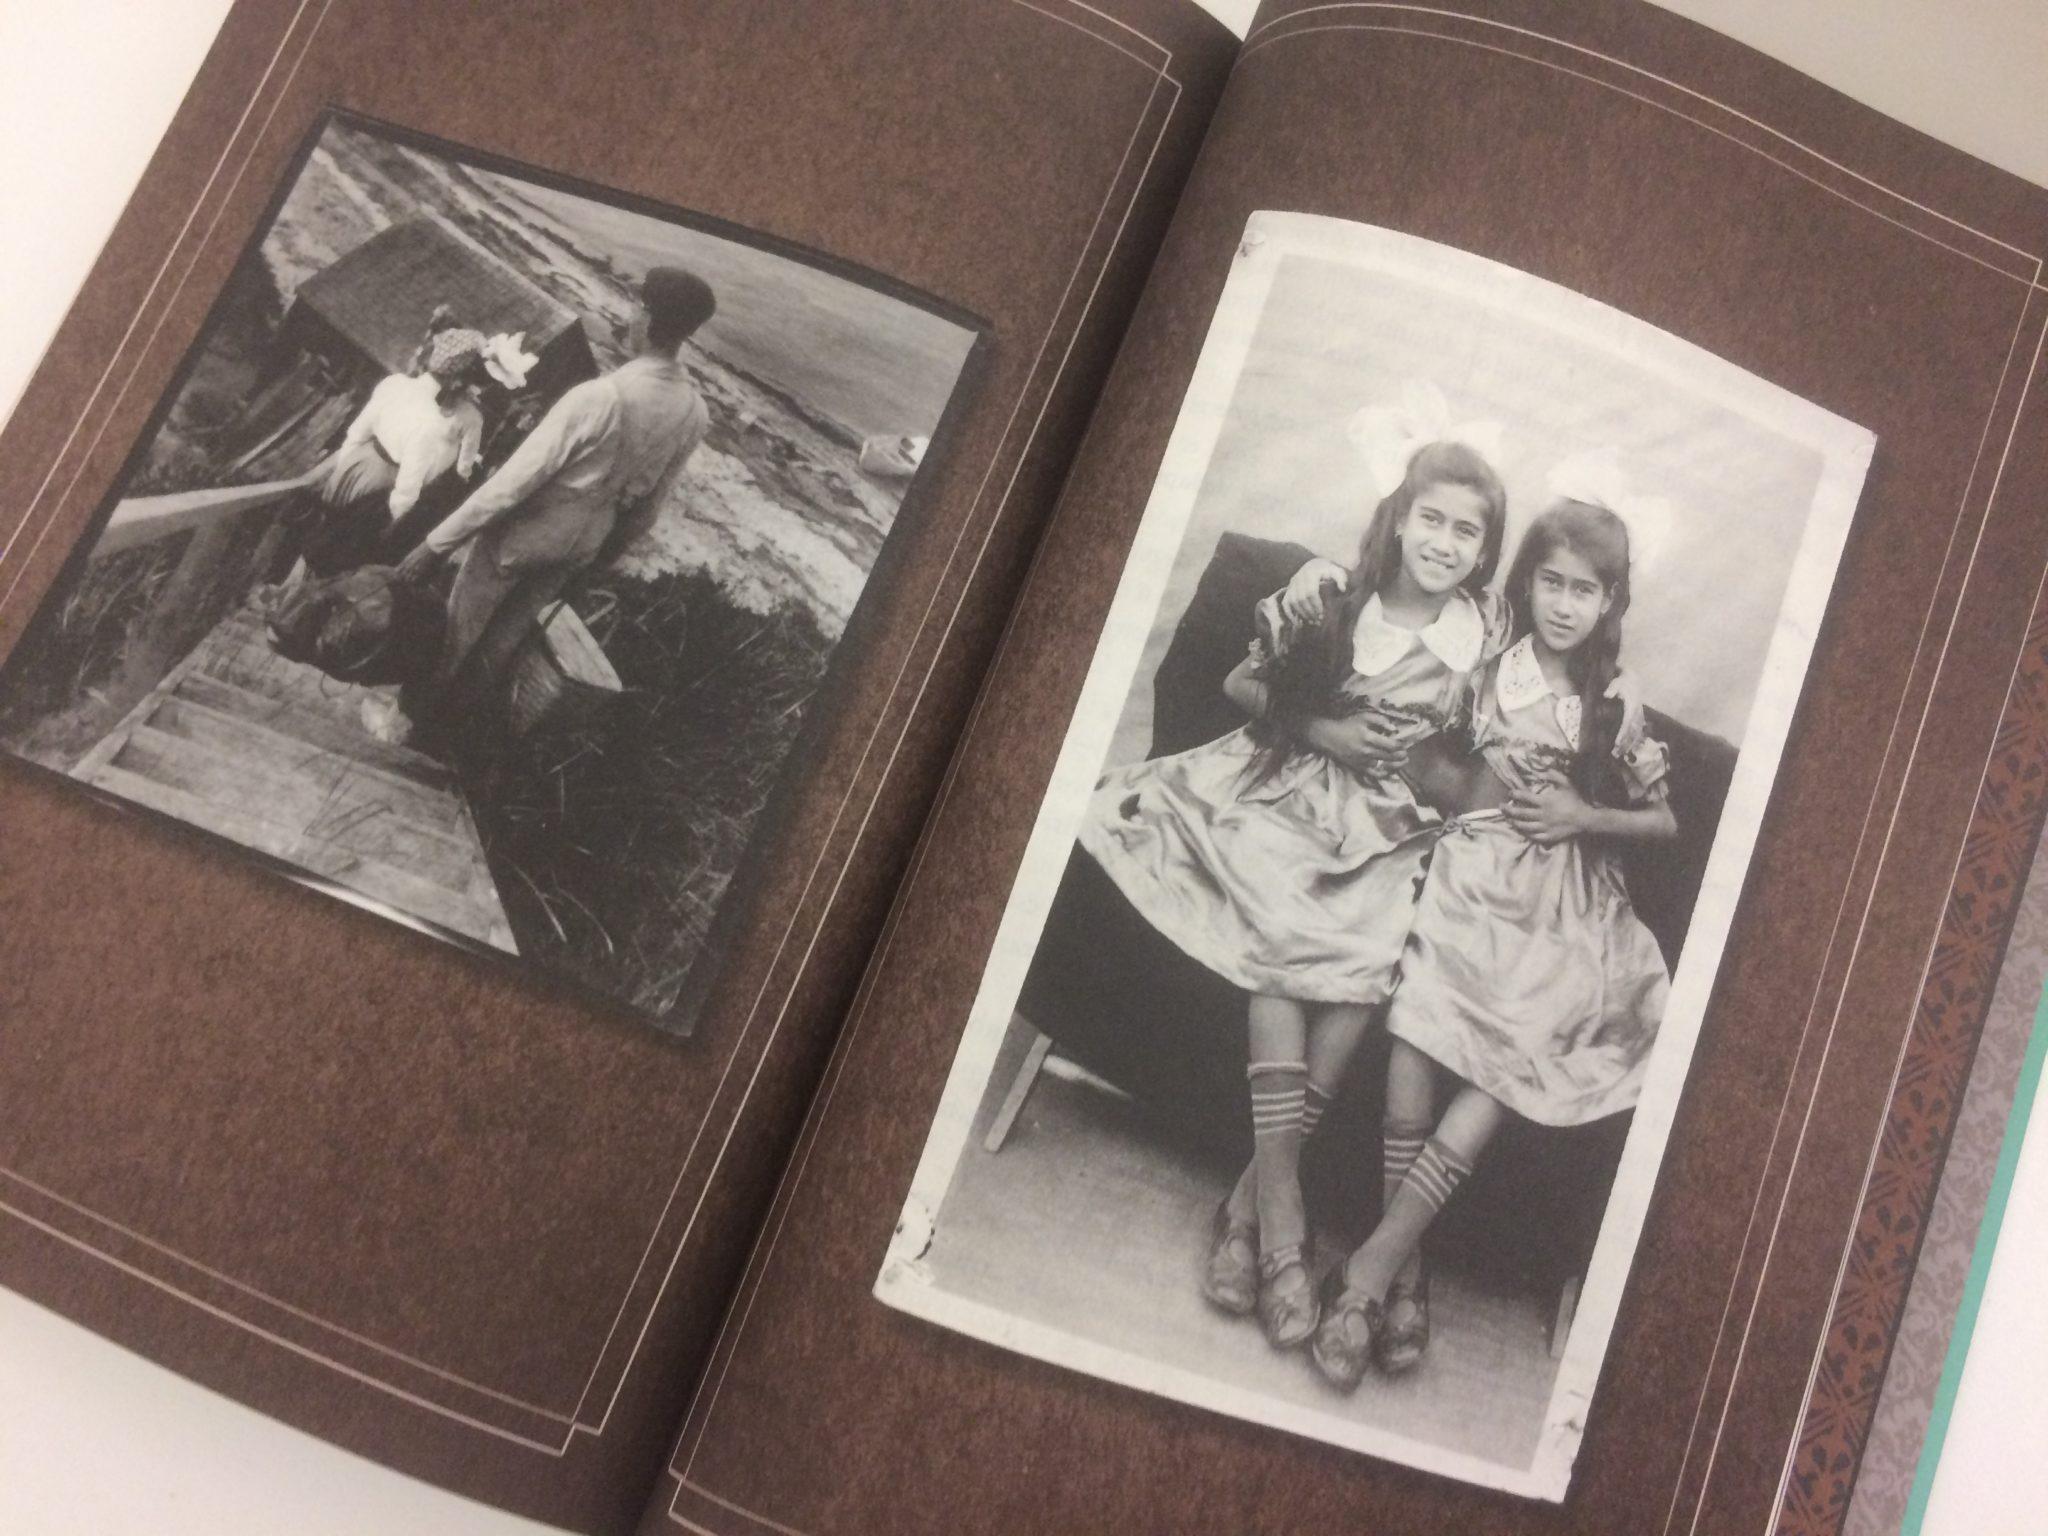 biblioteca-de-almas-srta-peregrine-cinema-de-buteco-resenha-2